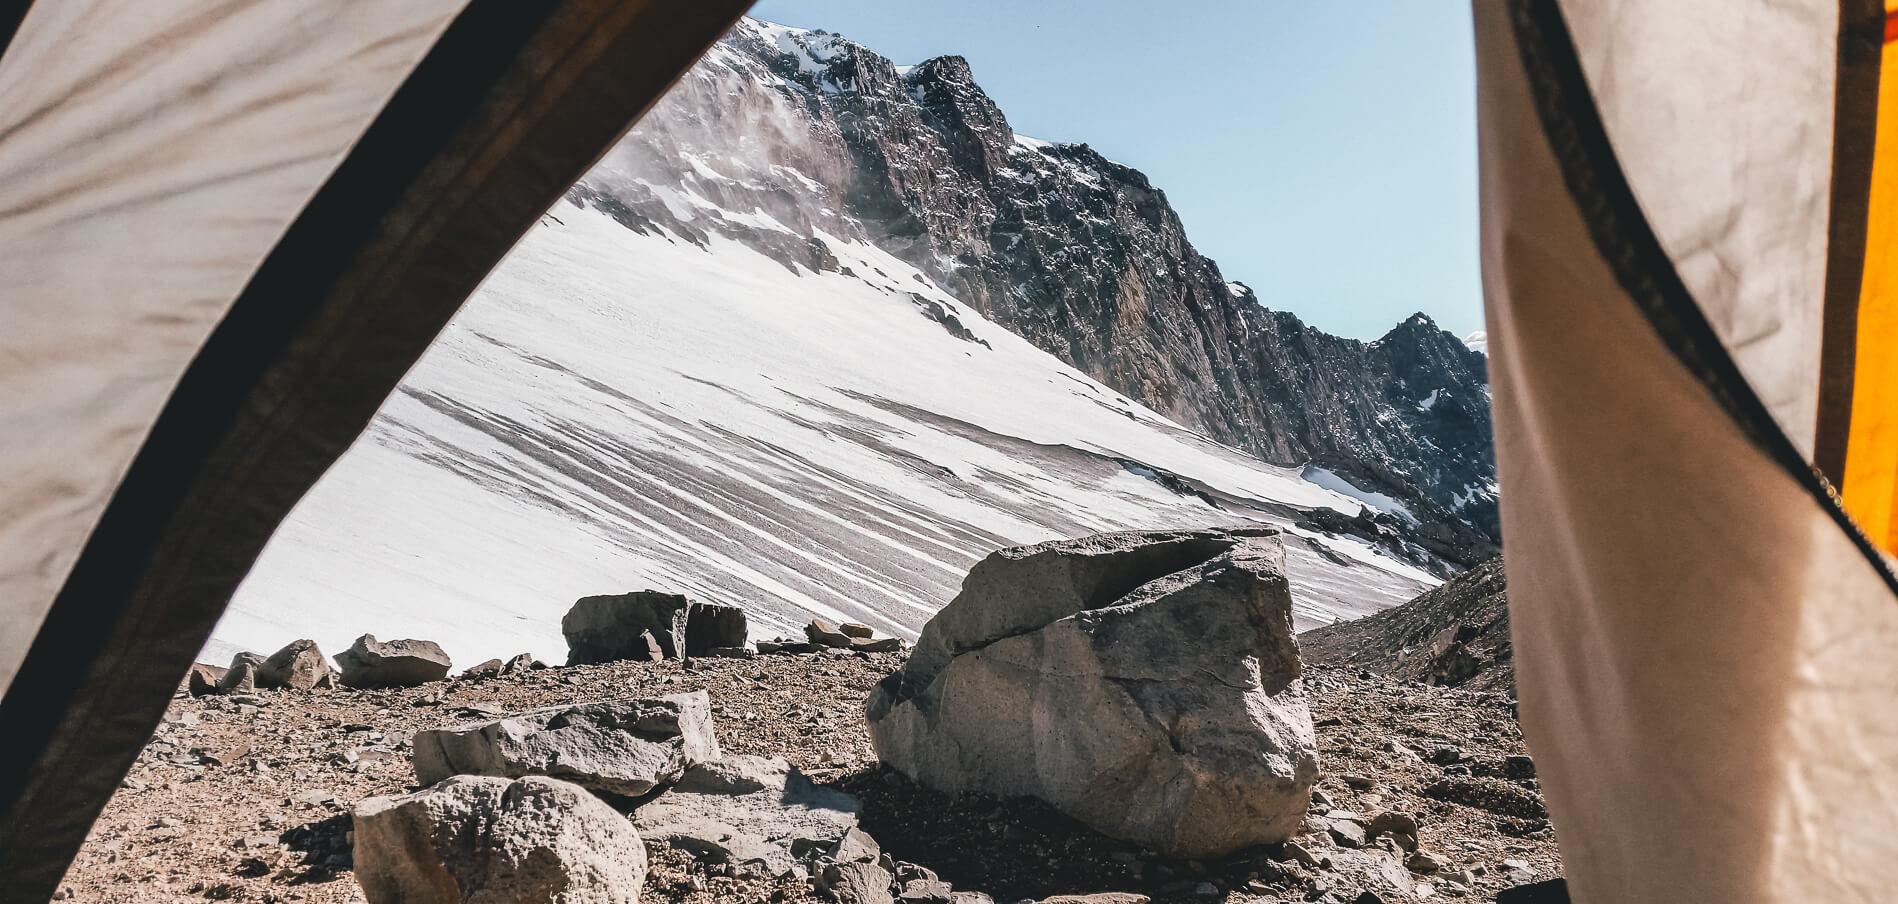 Expedition to climb Aconcagua